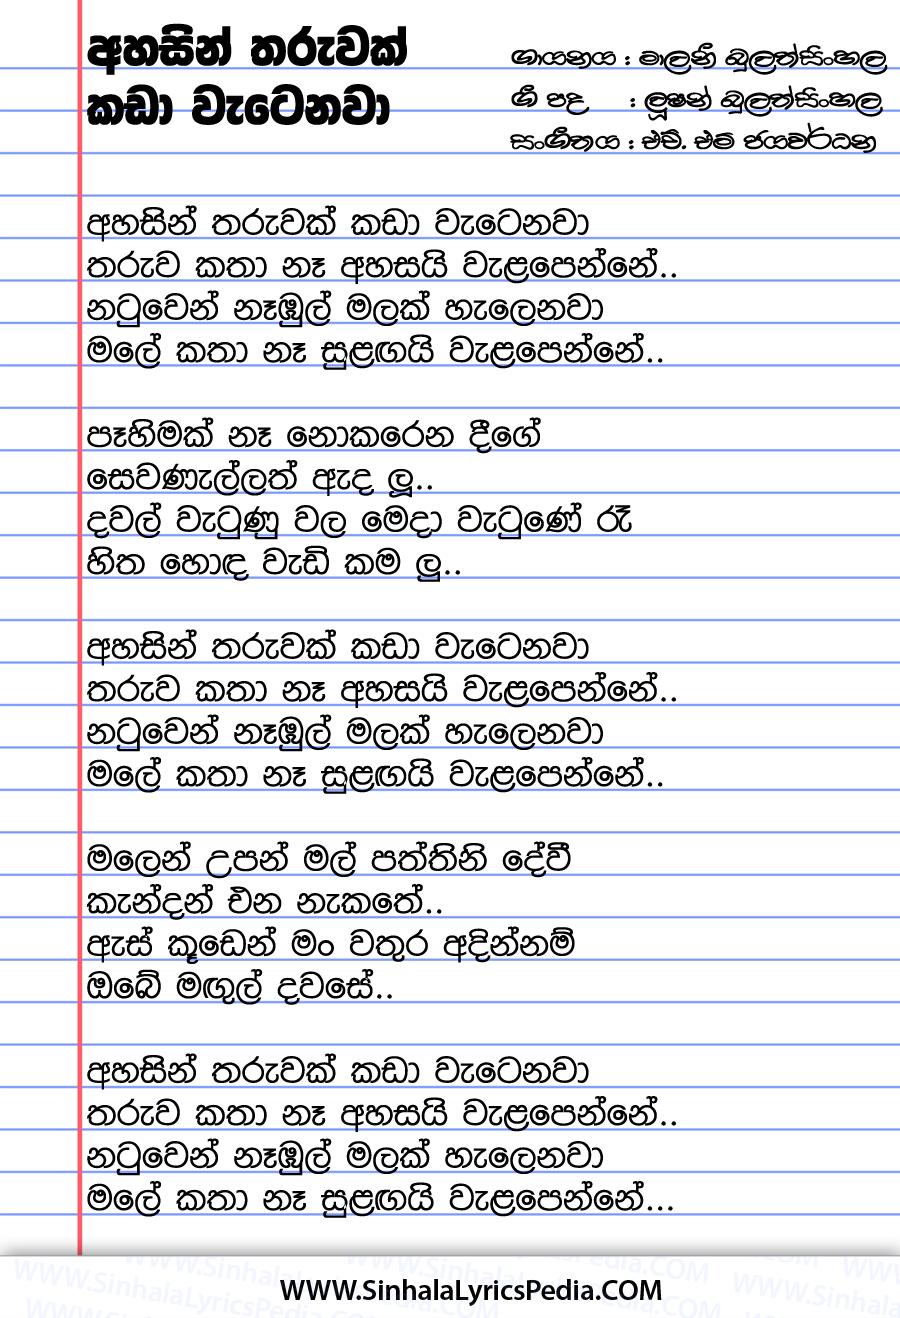 Ahasin Tharuwak Kada Watenawa Song Lyrics